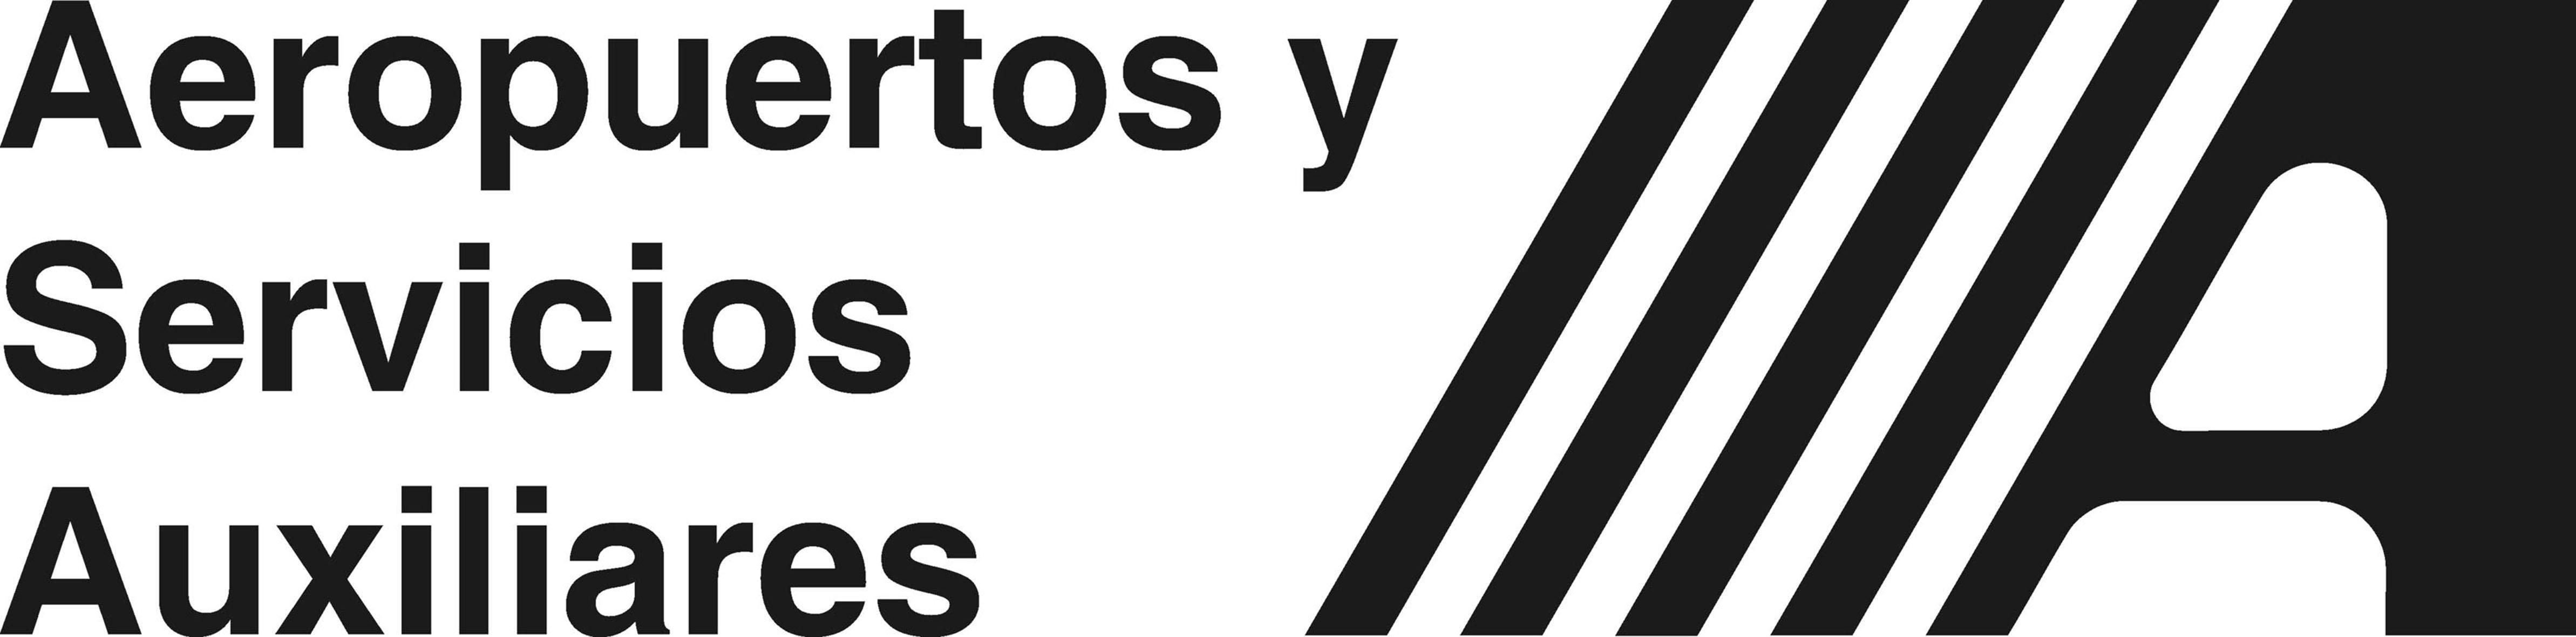 http://upload.wikimedia.org/wikipedia/commons/2/2e/Asa_logo.jpg